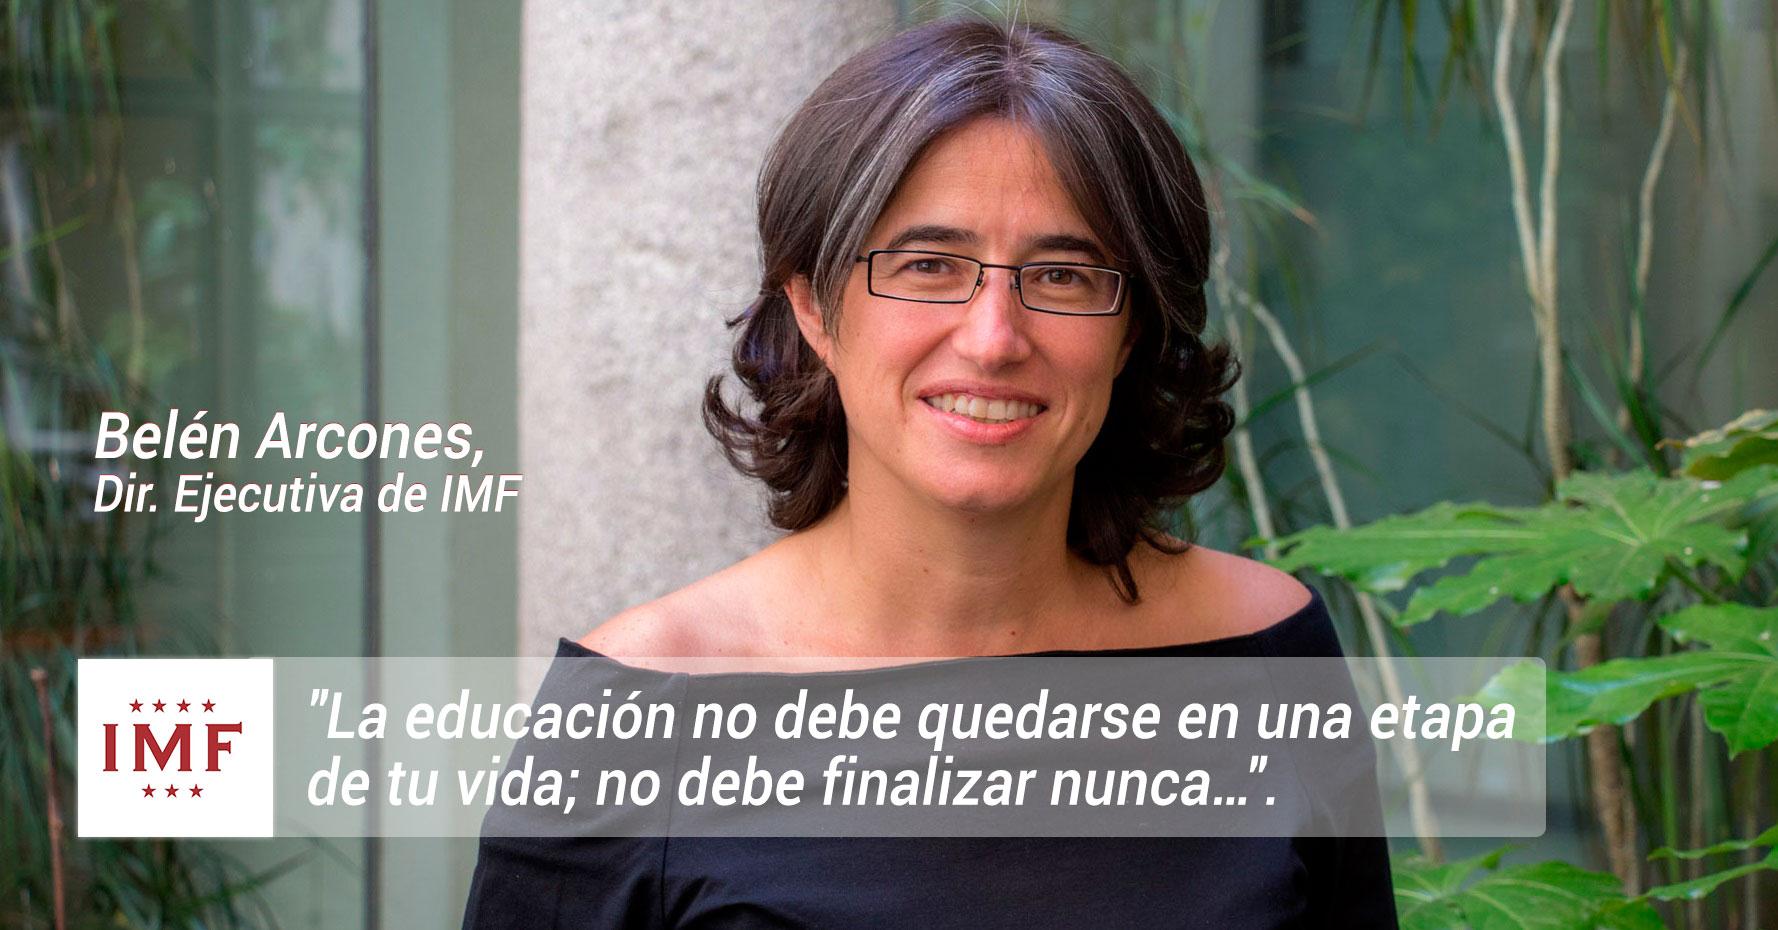 Belen_Arcones_educacion Belén Arcones, Dir. Ejecutiva de IMF: